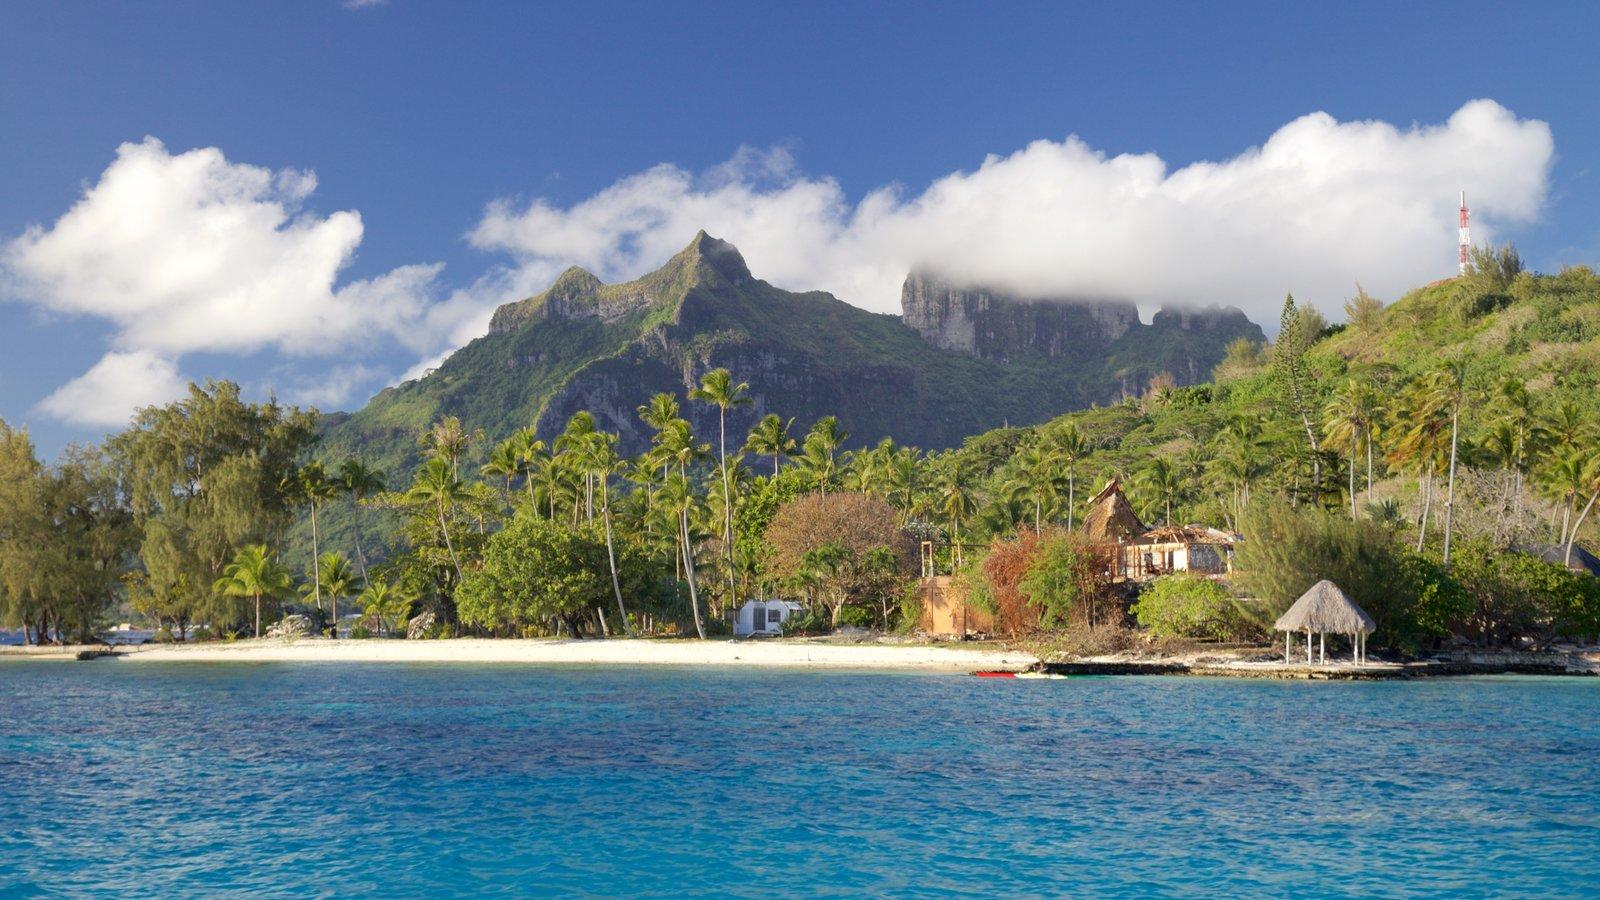 Bora Bora showing general coastal views, landscape views and a beach